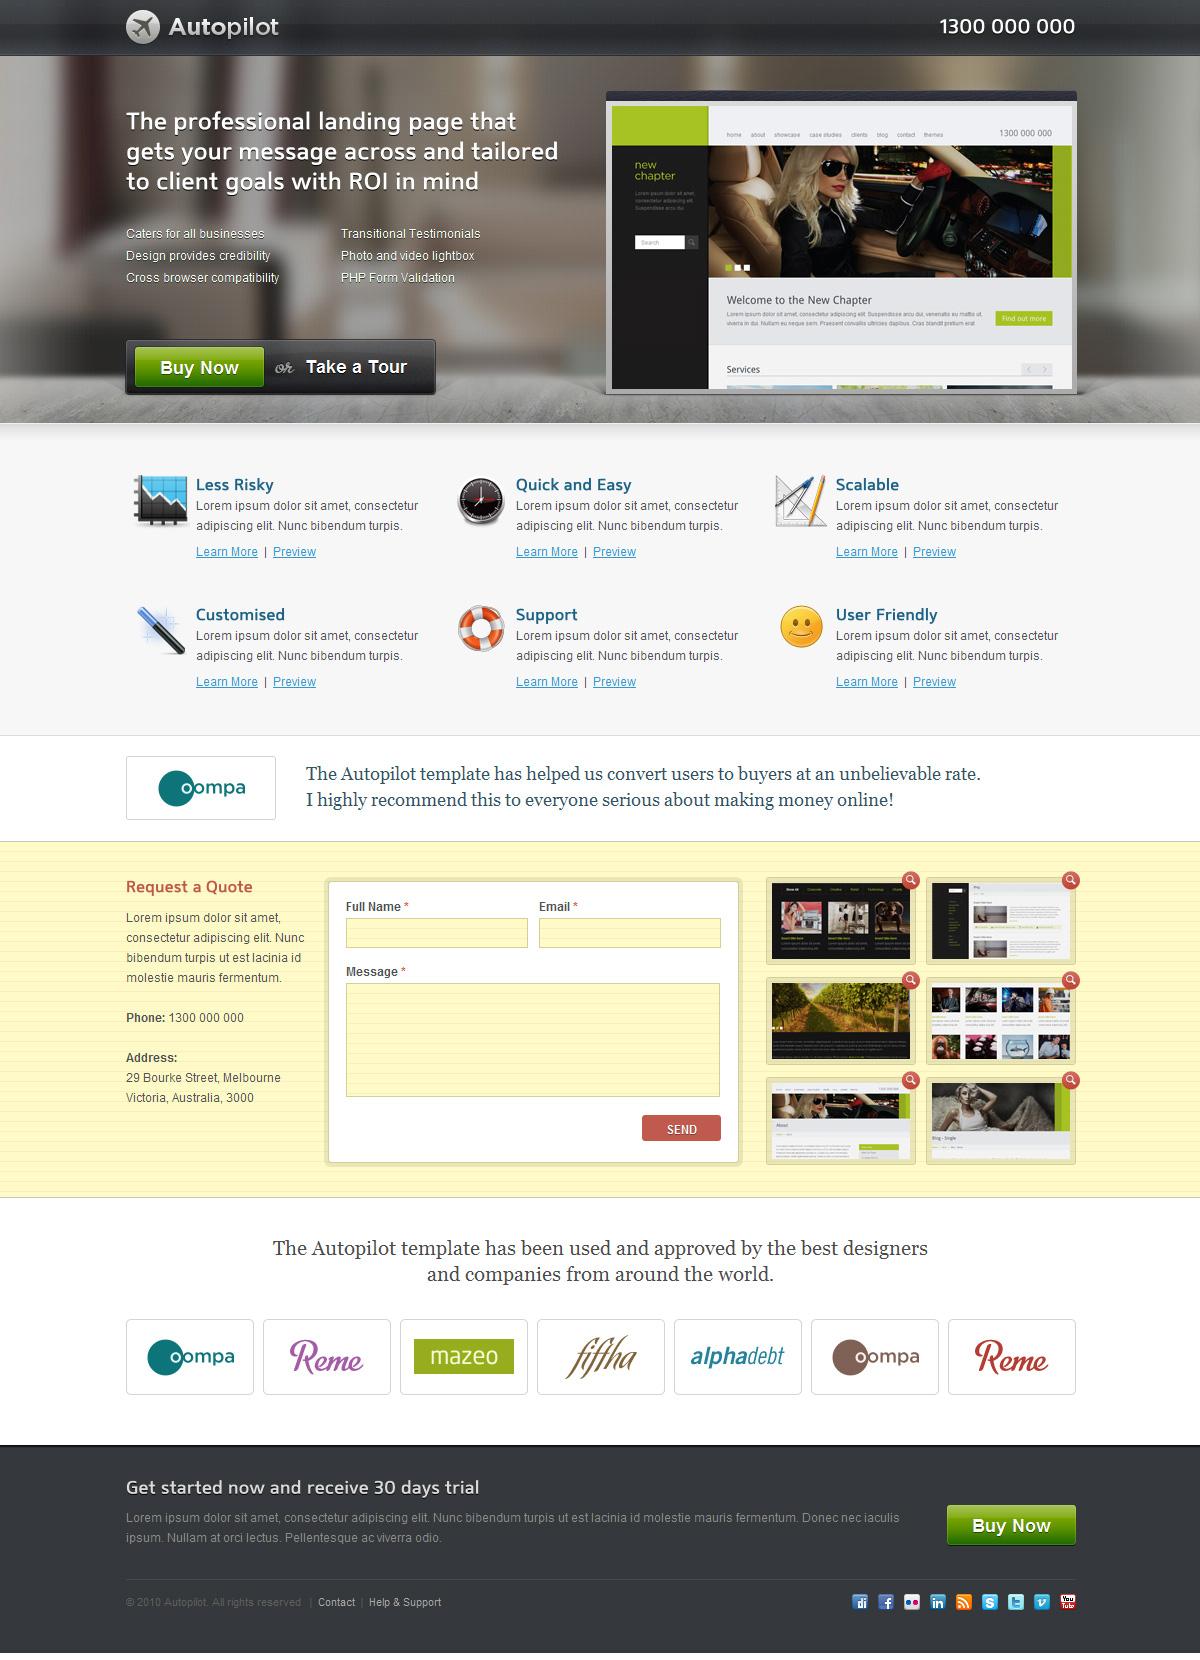 Autopilot Landing Page (3 Themes) - Screenshot 02 - Realistic